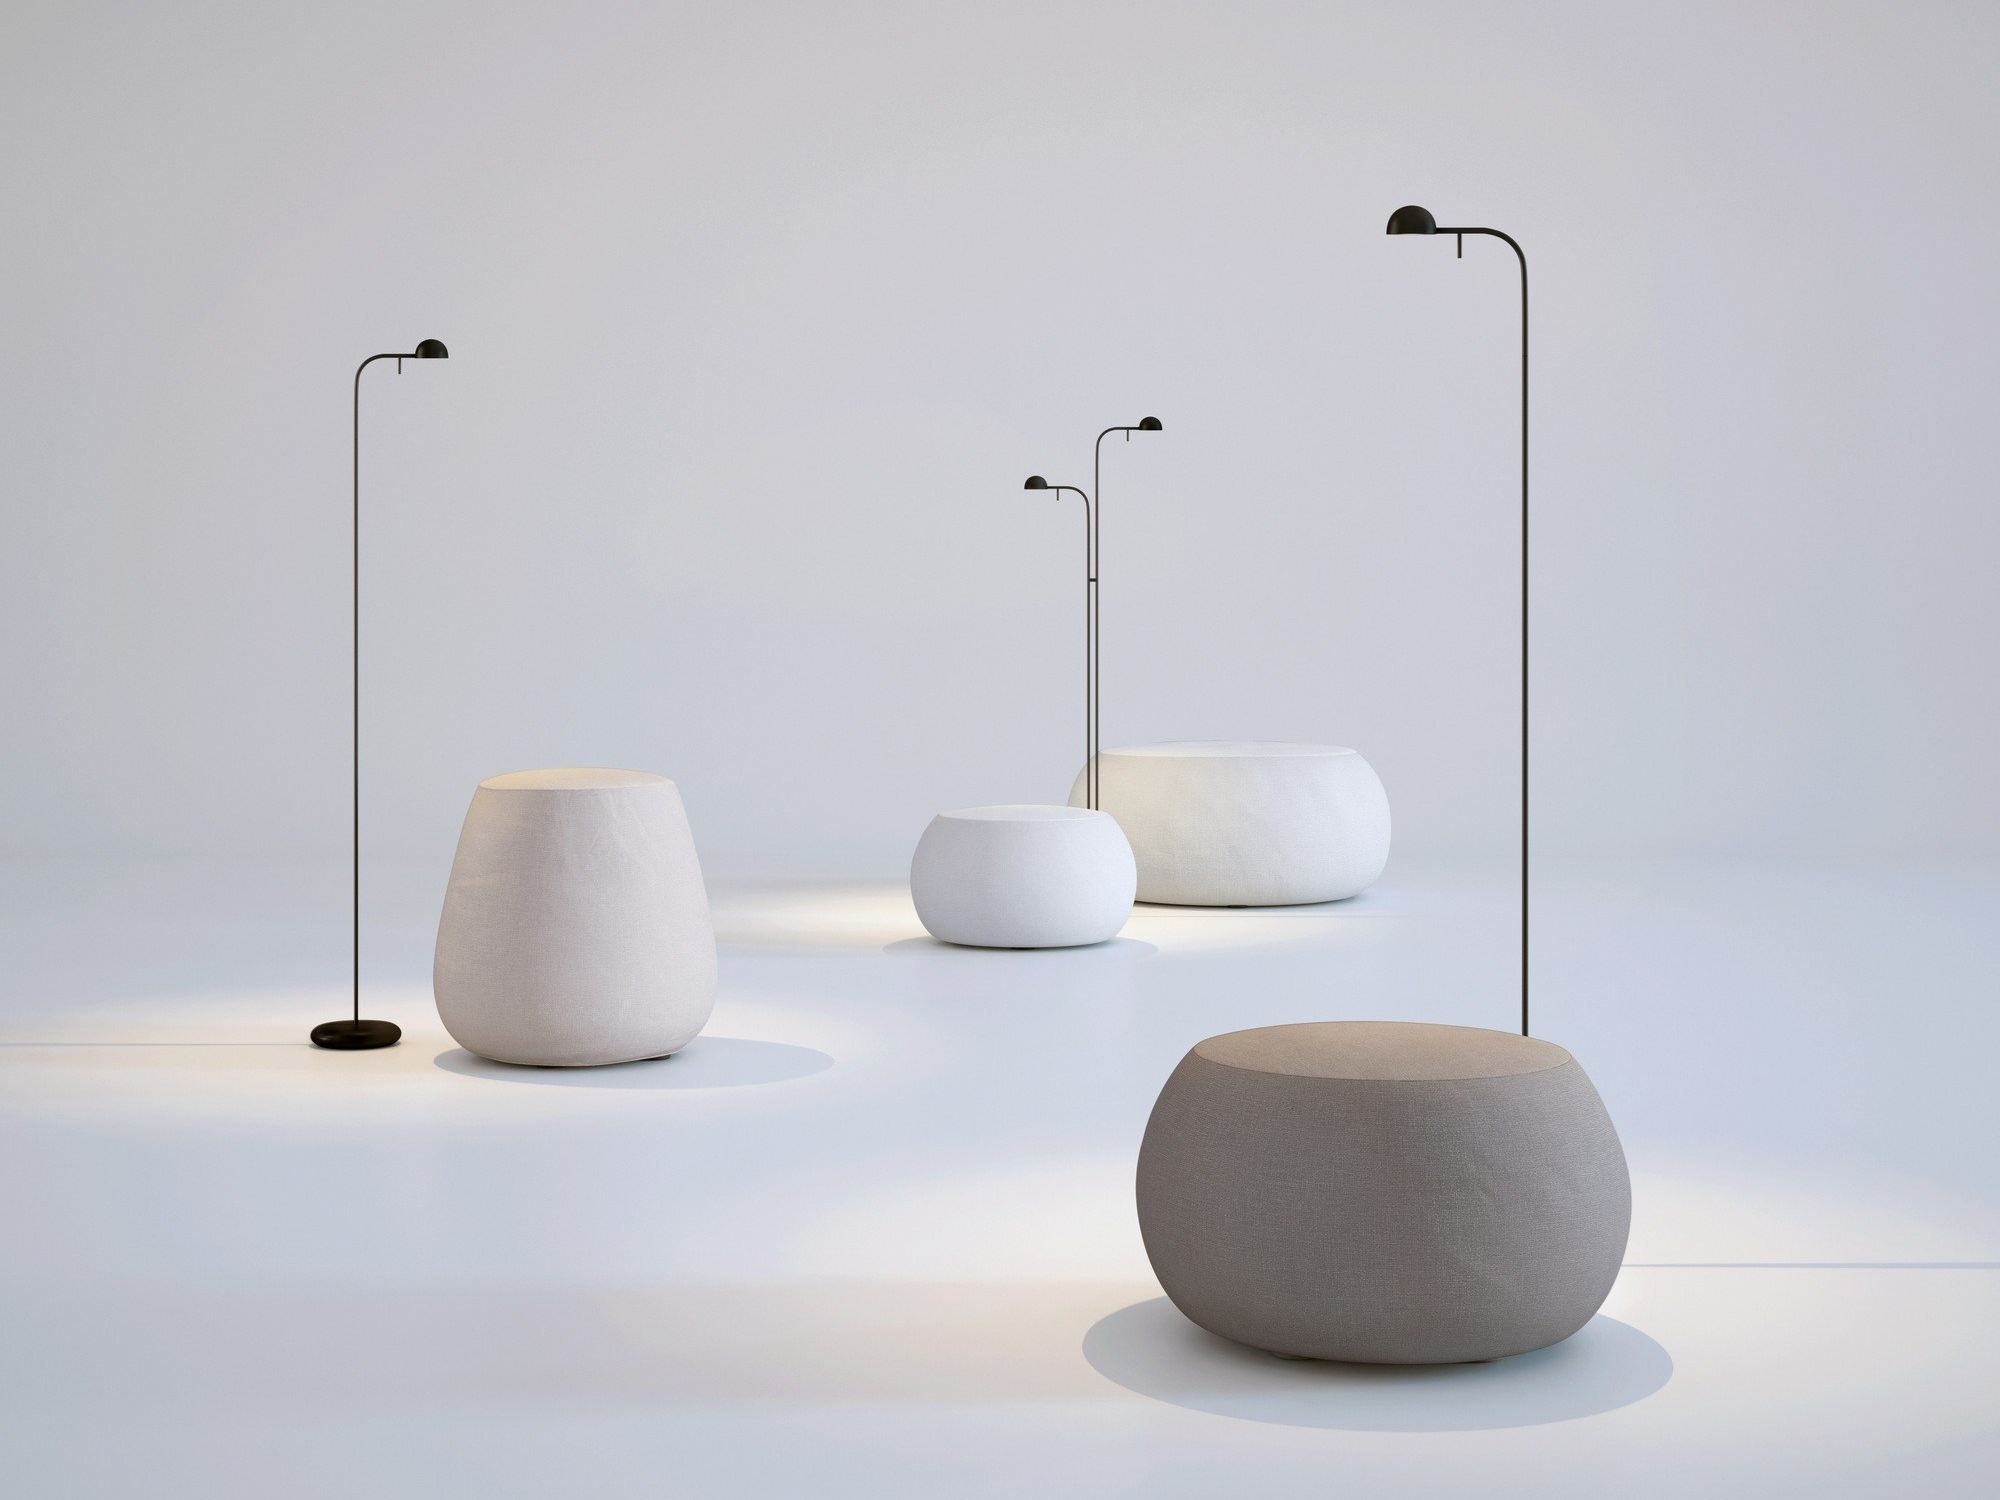 Lampade flos piantane amazing pi foto with lampade flos piantane